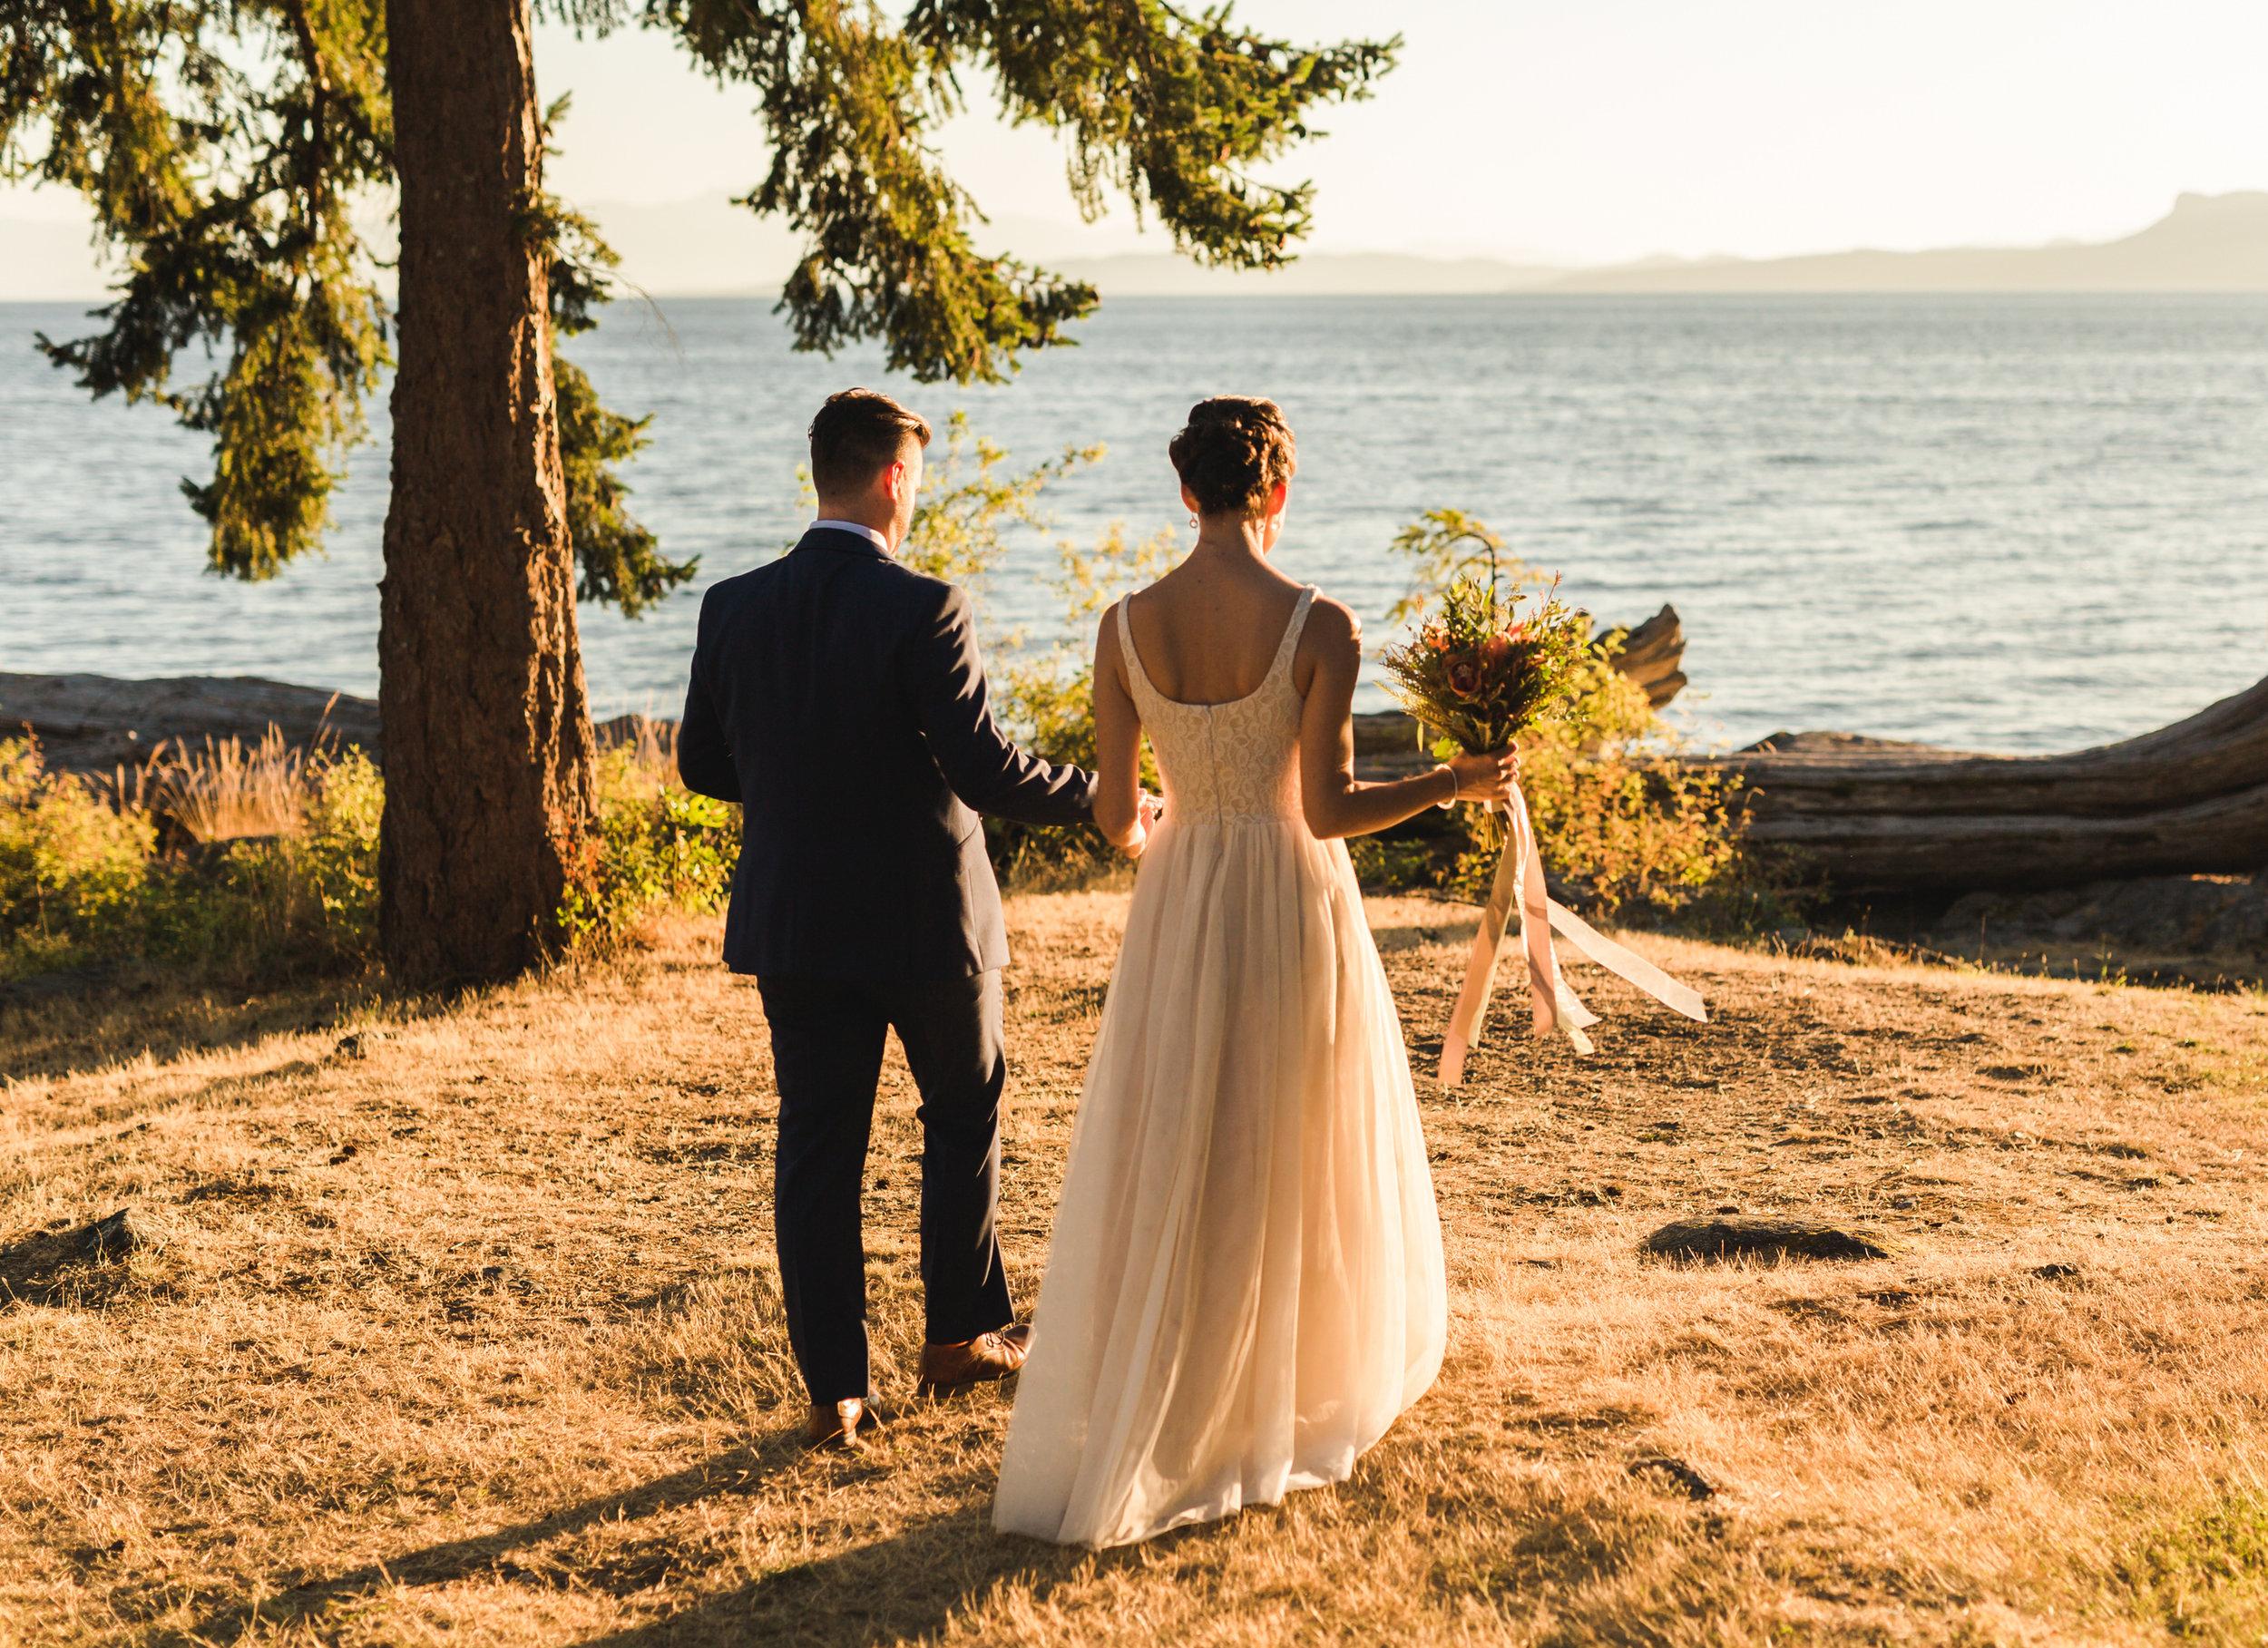 Rockwater Secret Cove Resort Wedding - Sunshine Coast BC Wedding Photographer - Vancouver Wedding Photographer - Sunshine Coast Elopement Photos - IMG_1510.jpg